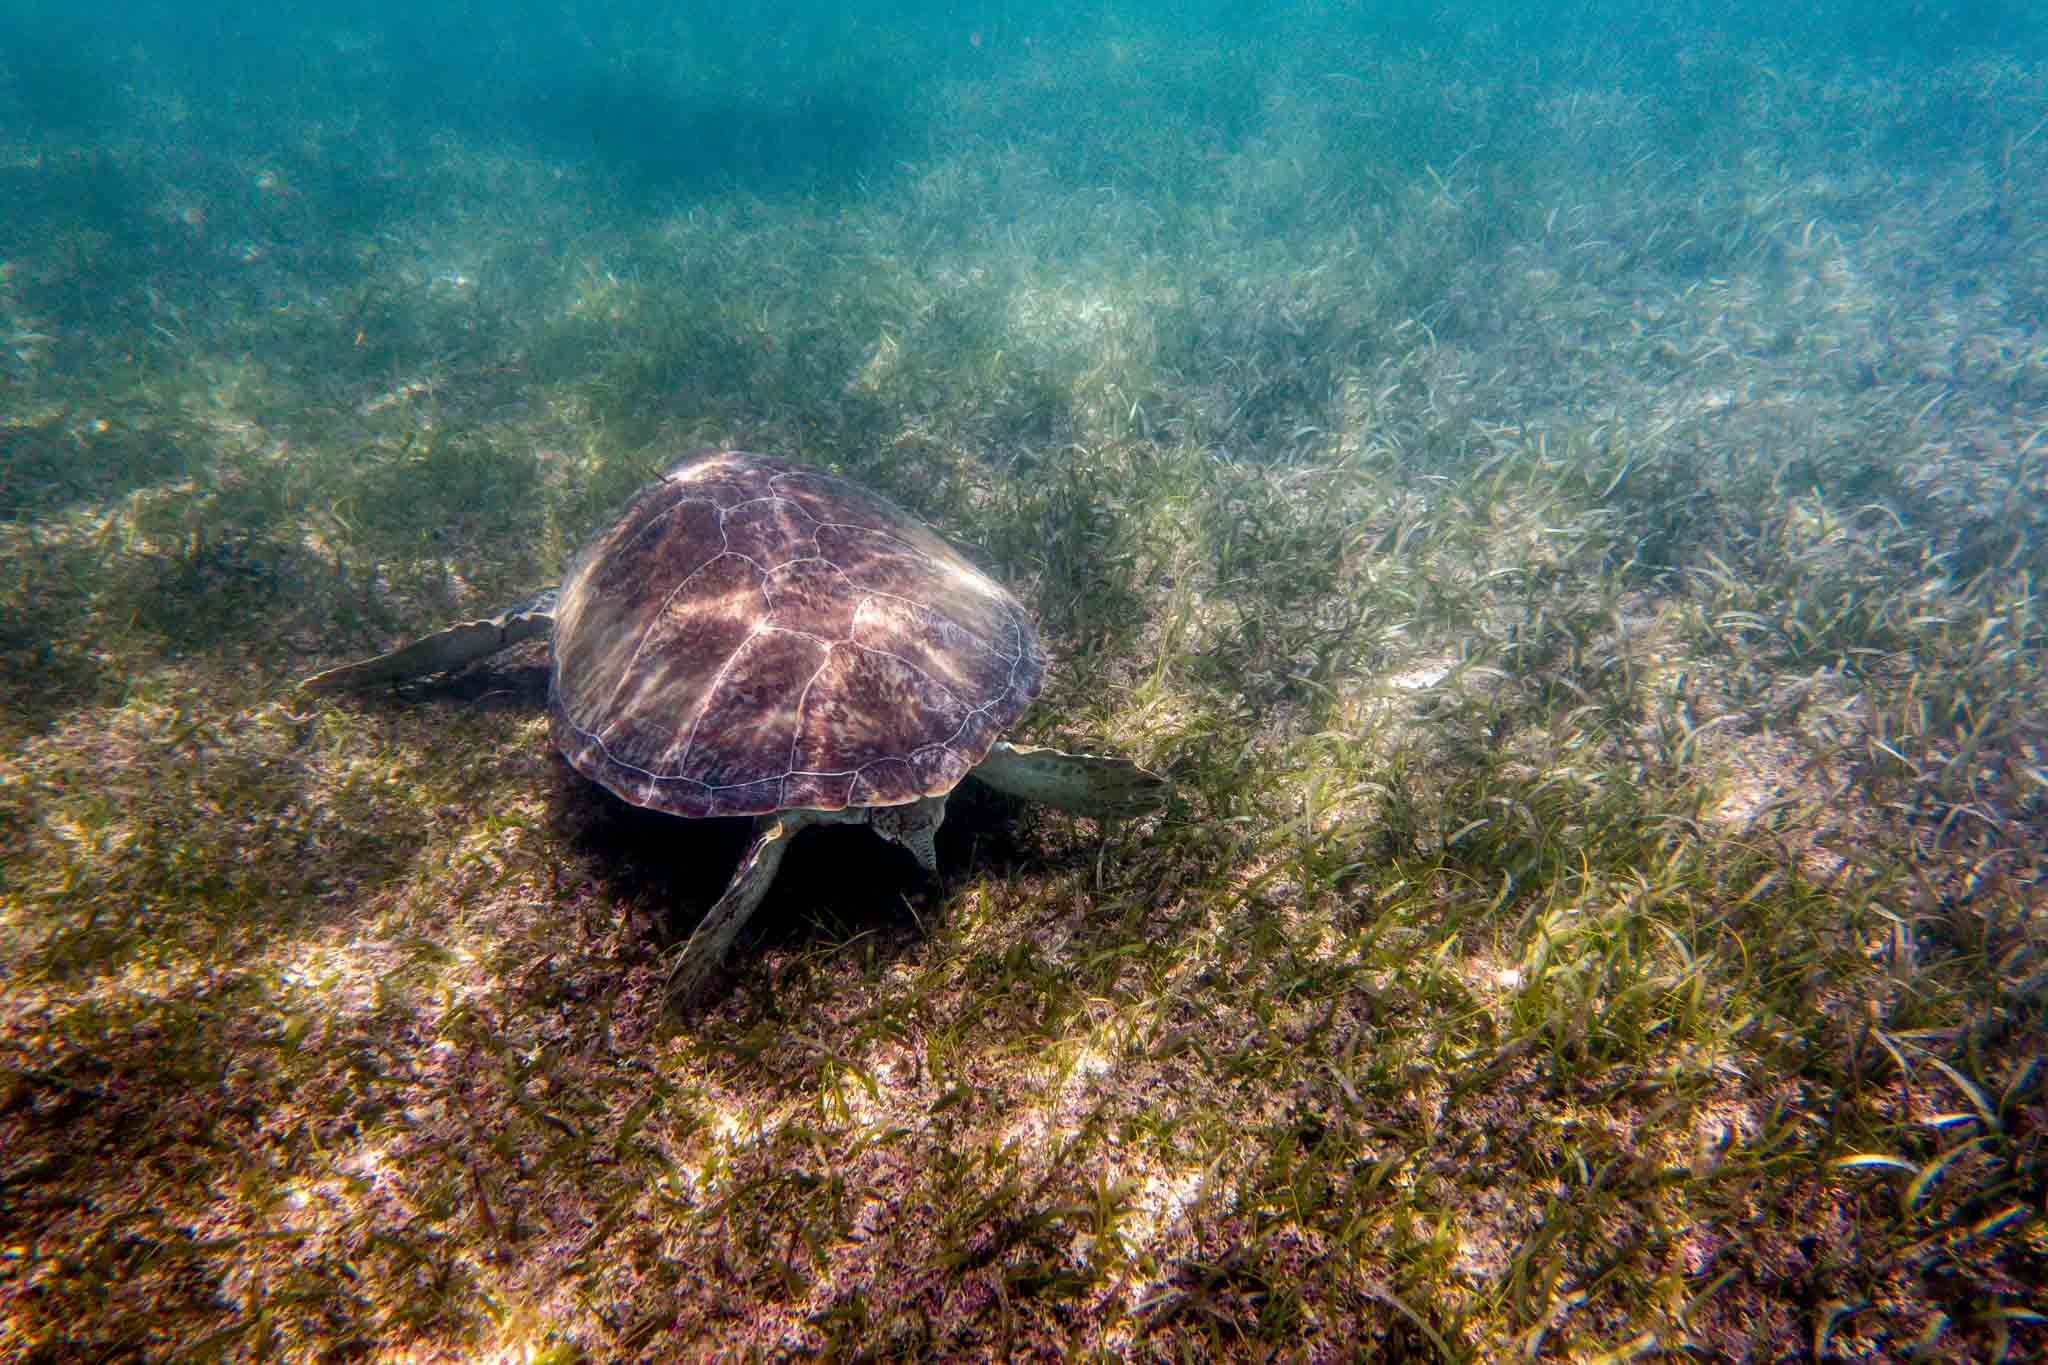 Sea turtle eating sea grass underwater